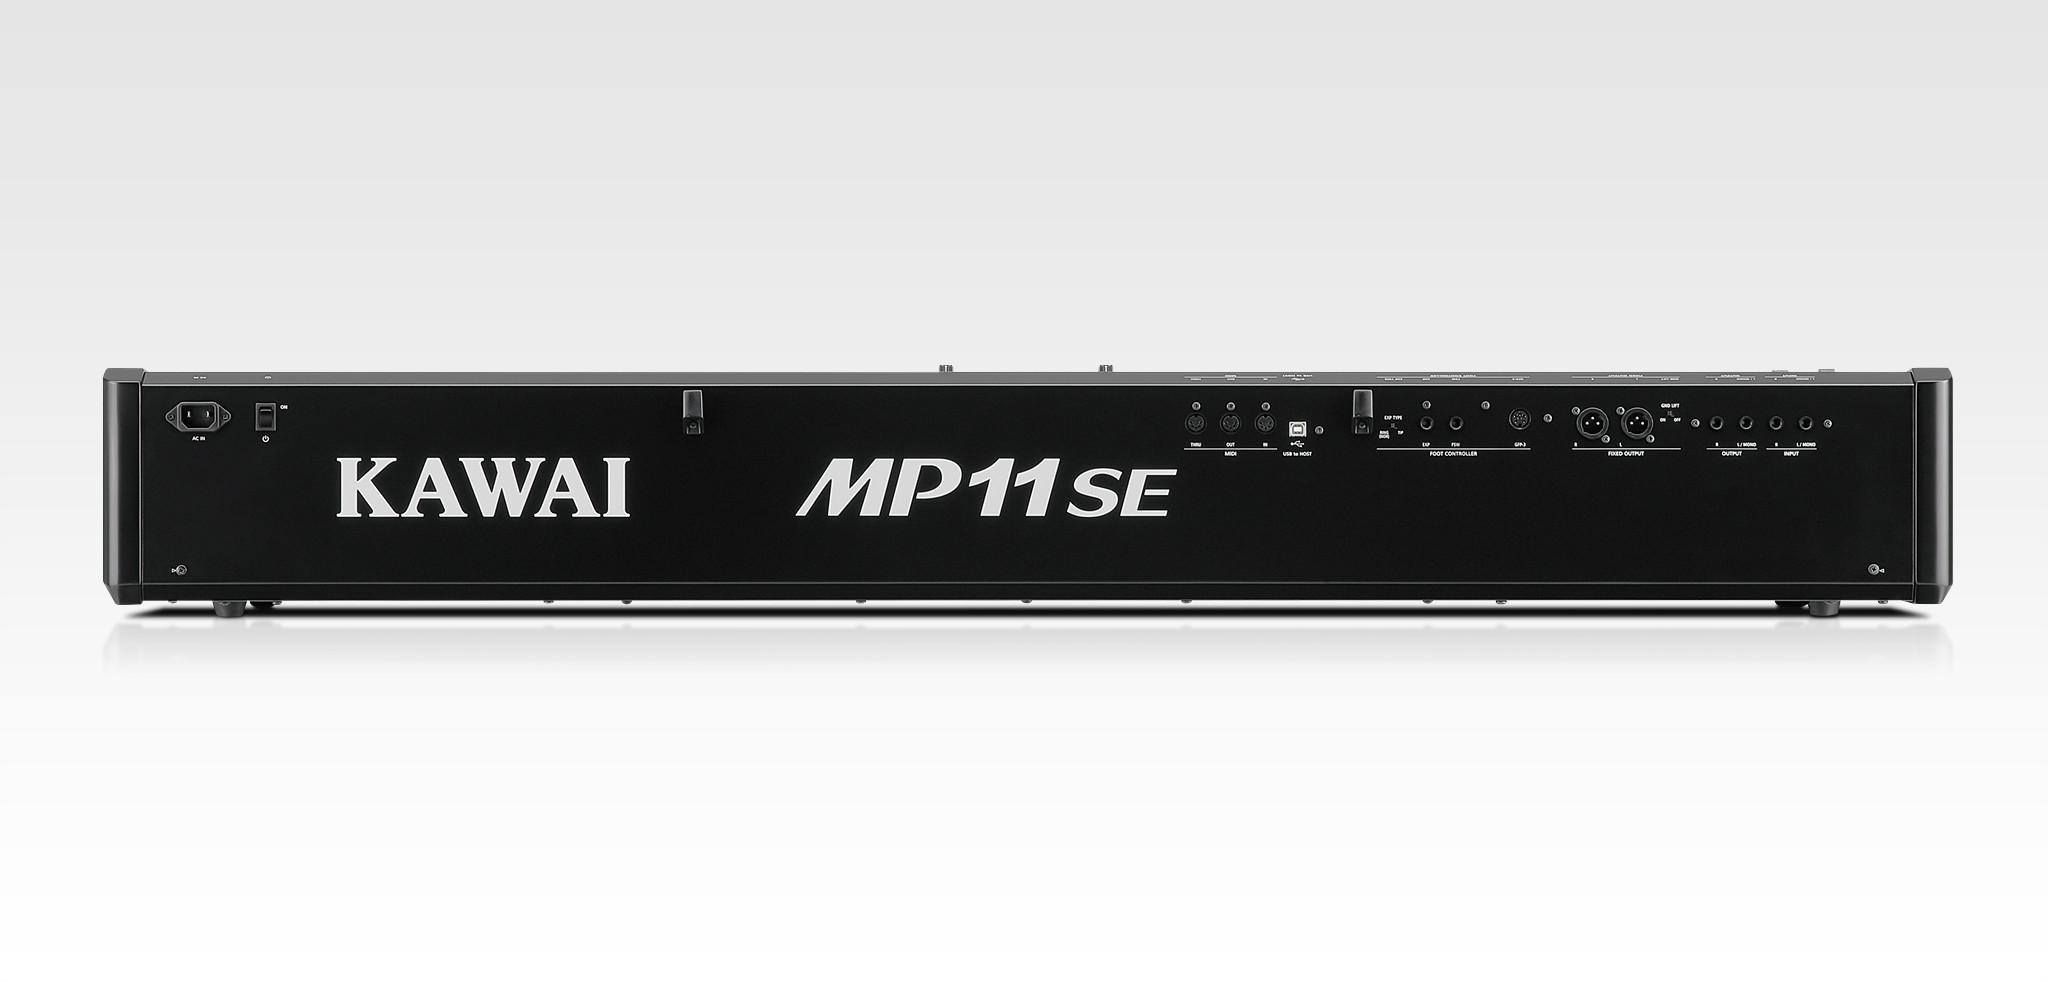 MP11SE